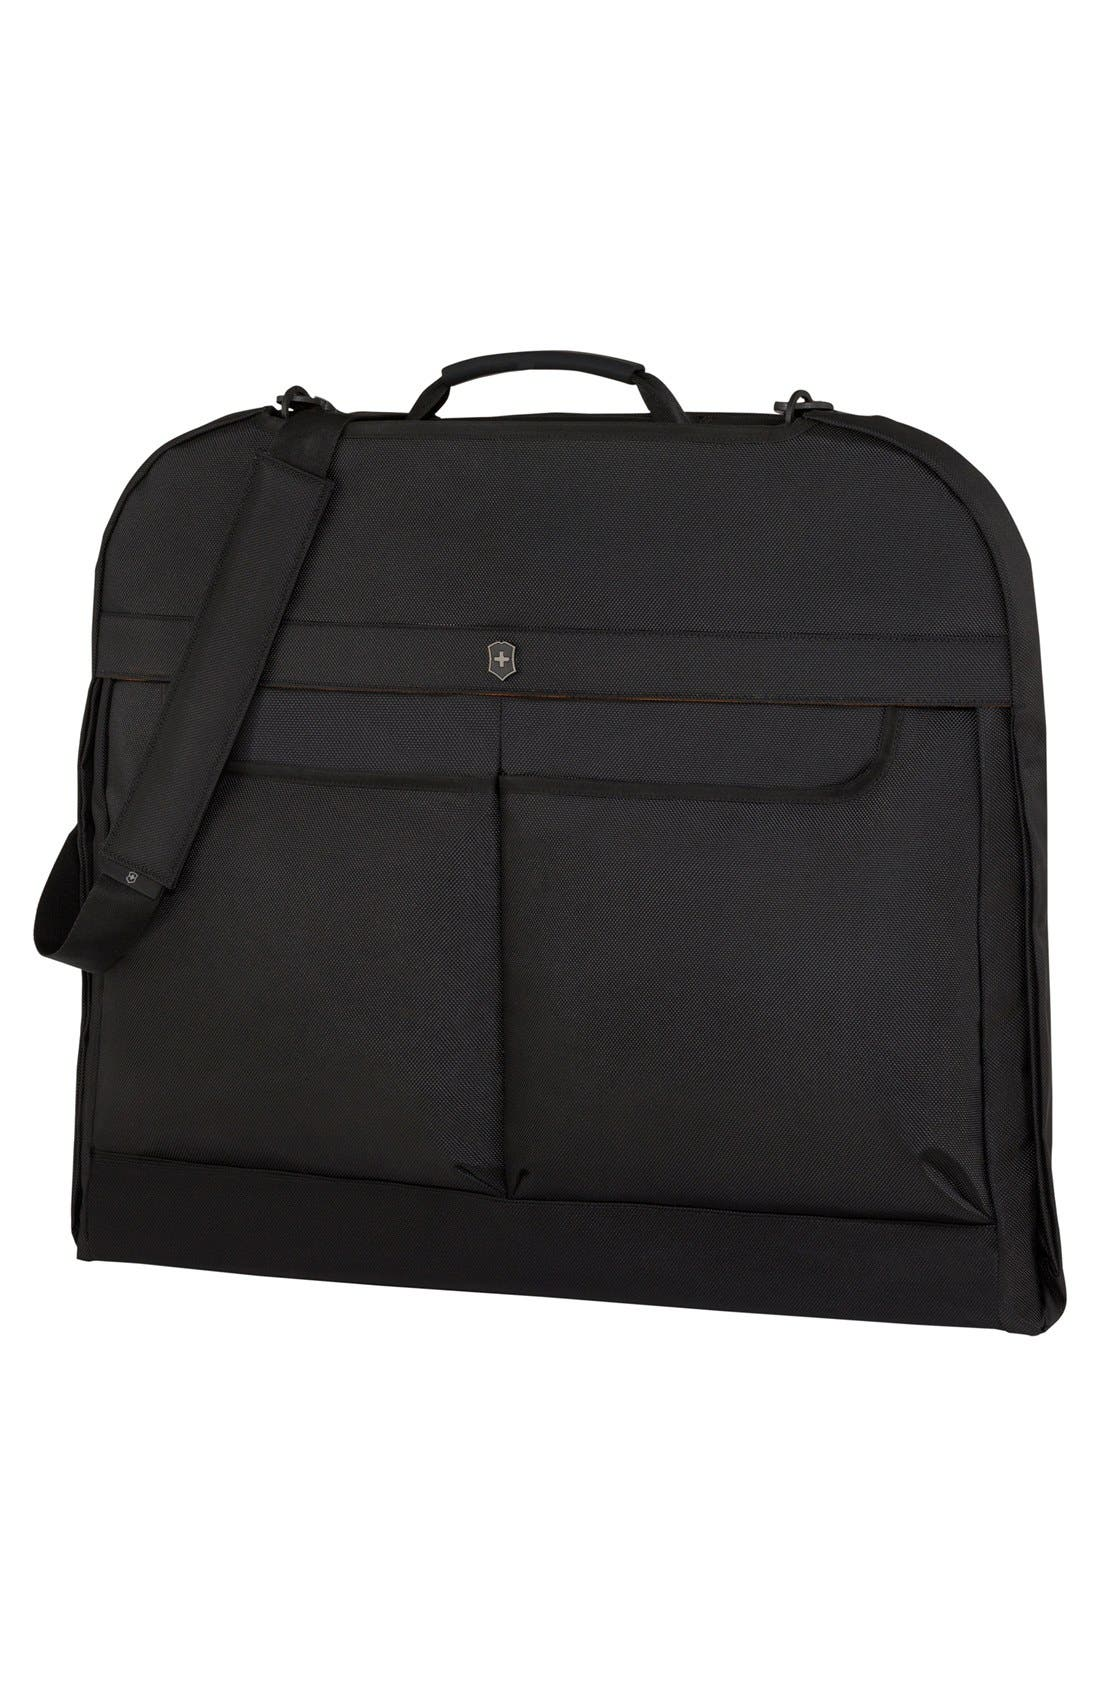 WT 5.0 Deluxe Garment Bag,                             Main thumbnail 1, color,                             001